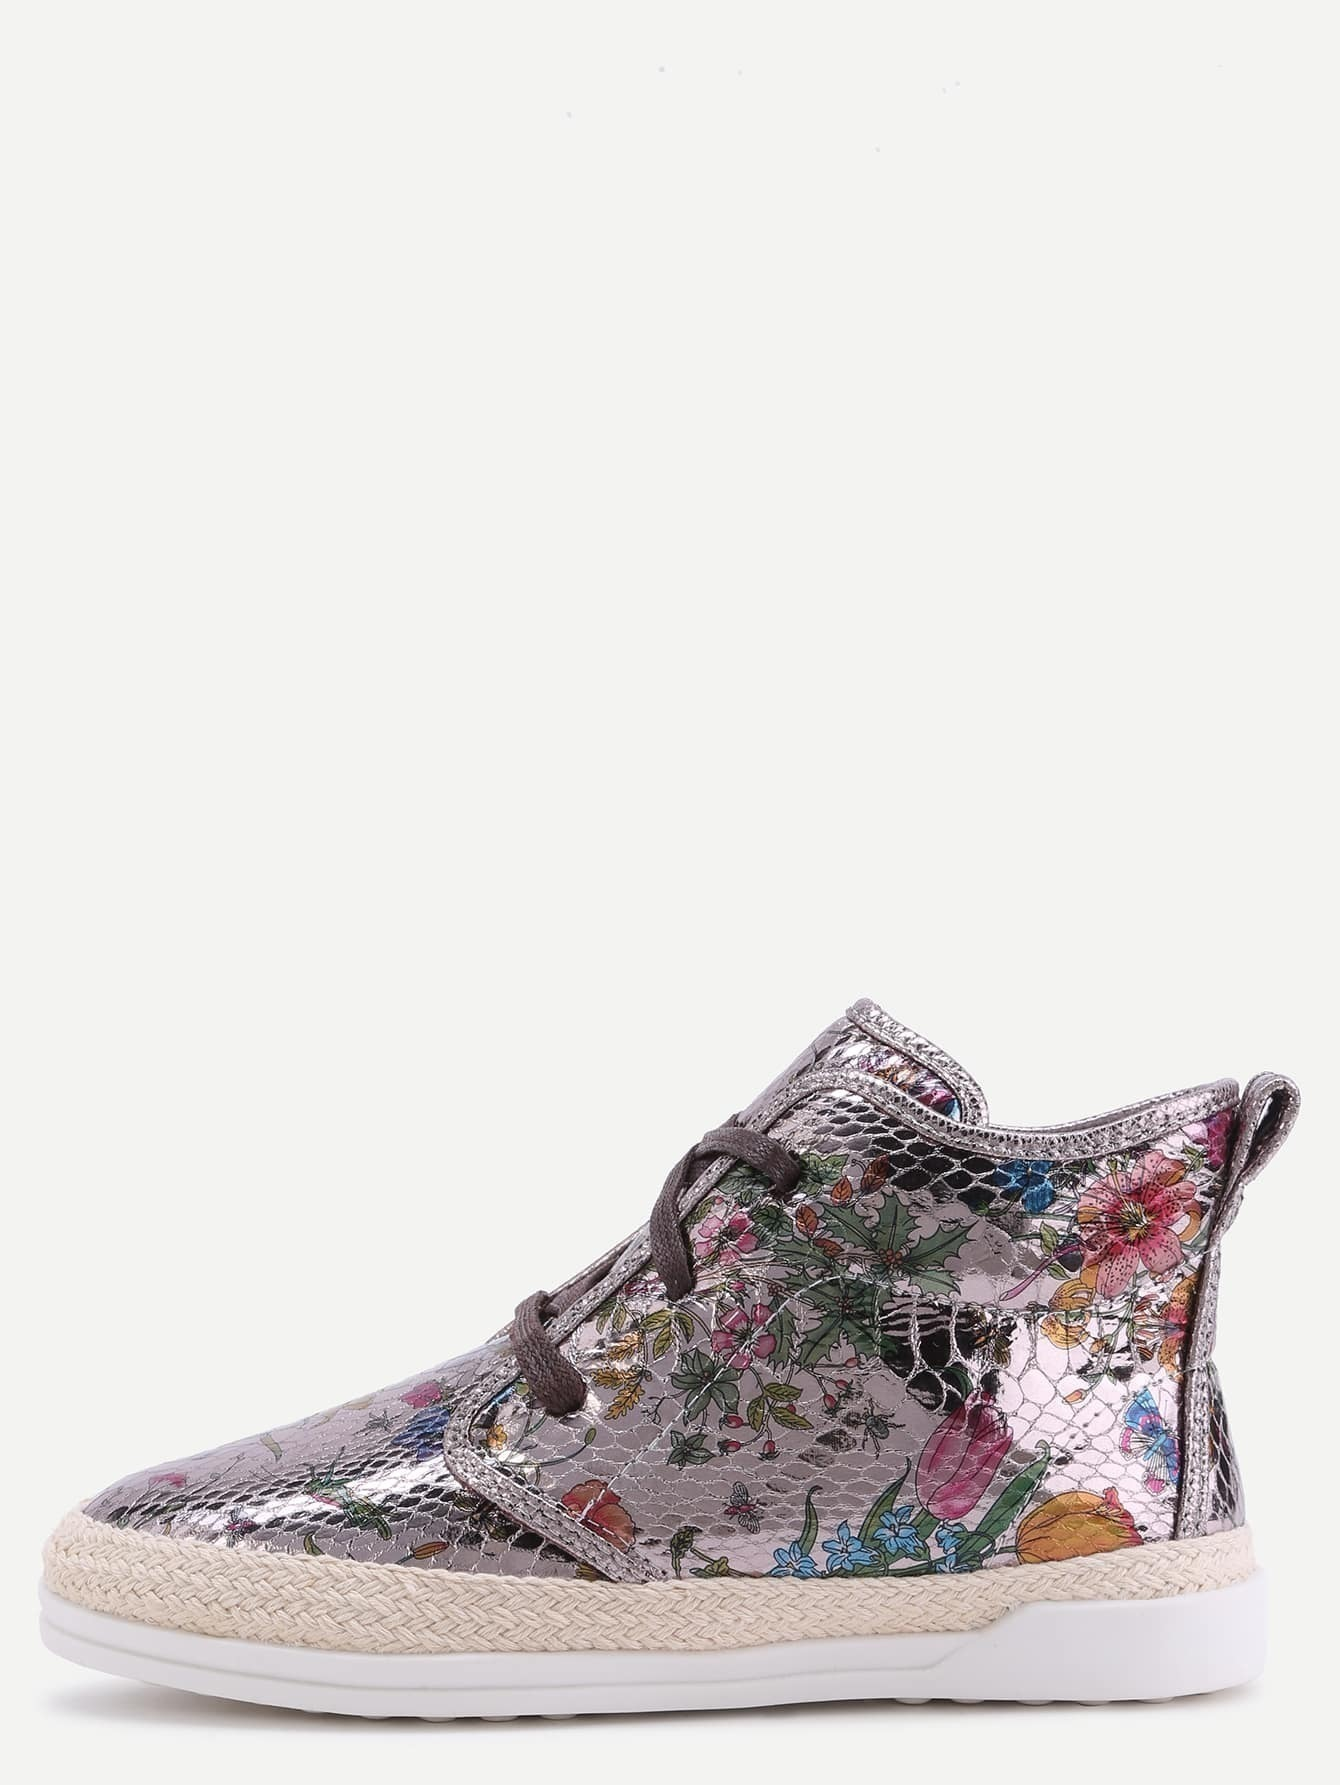 4ec607dfae7 Floral PU Snakeskin Espadrille Sneakers EmmaCloth-Women Fast Fashion ...